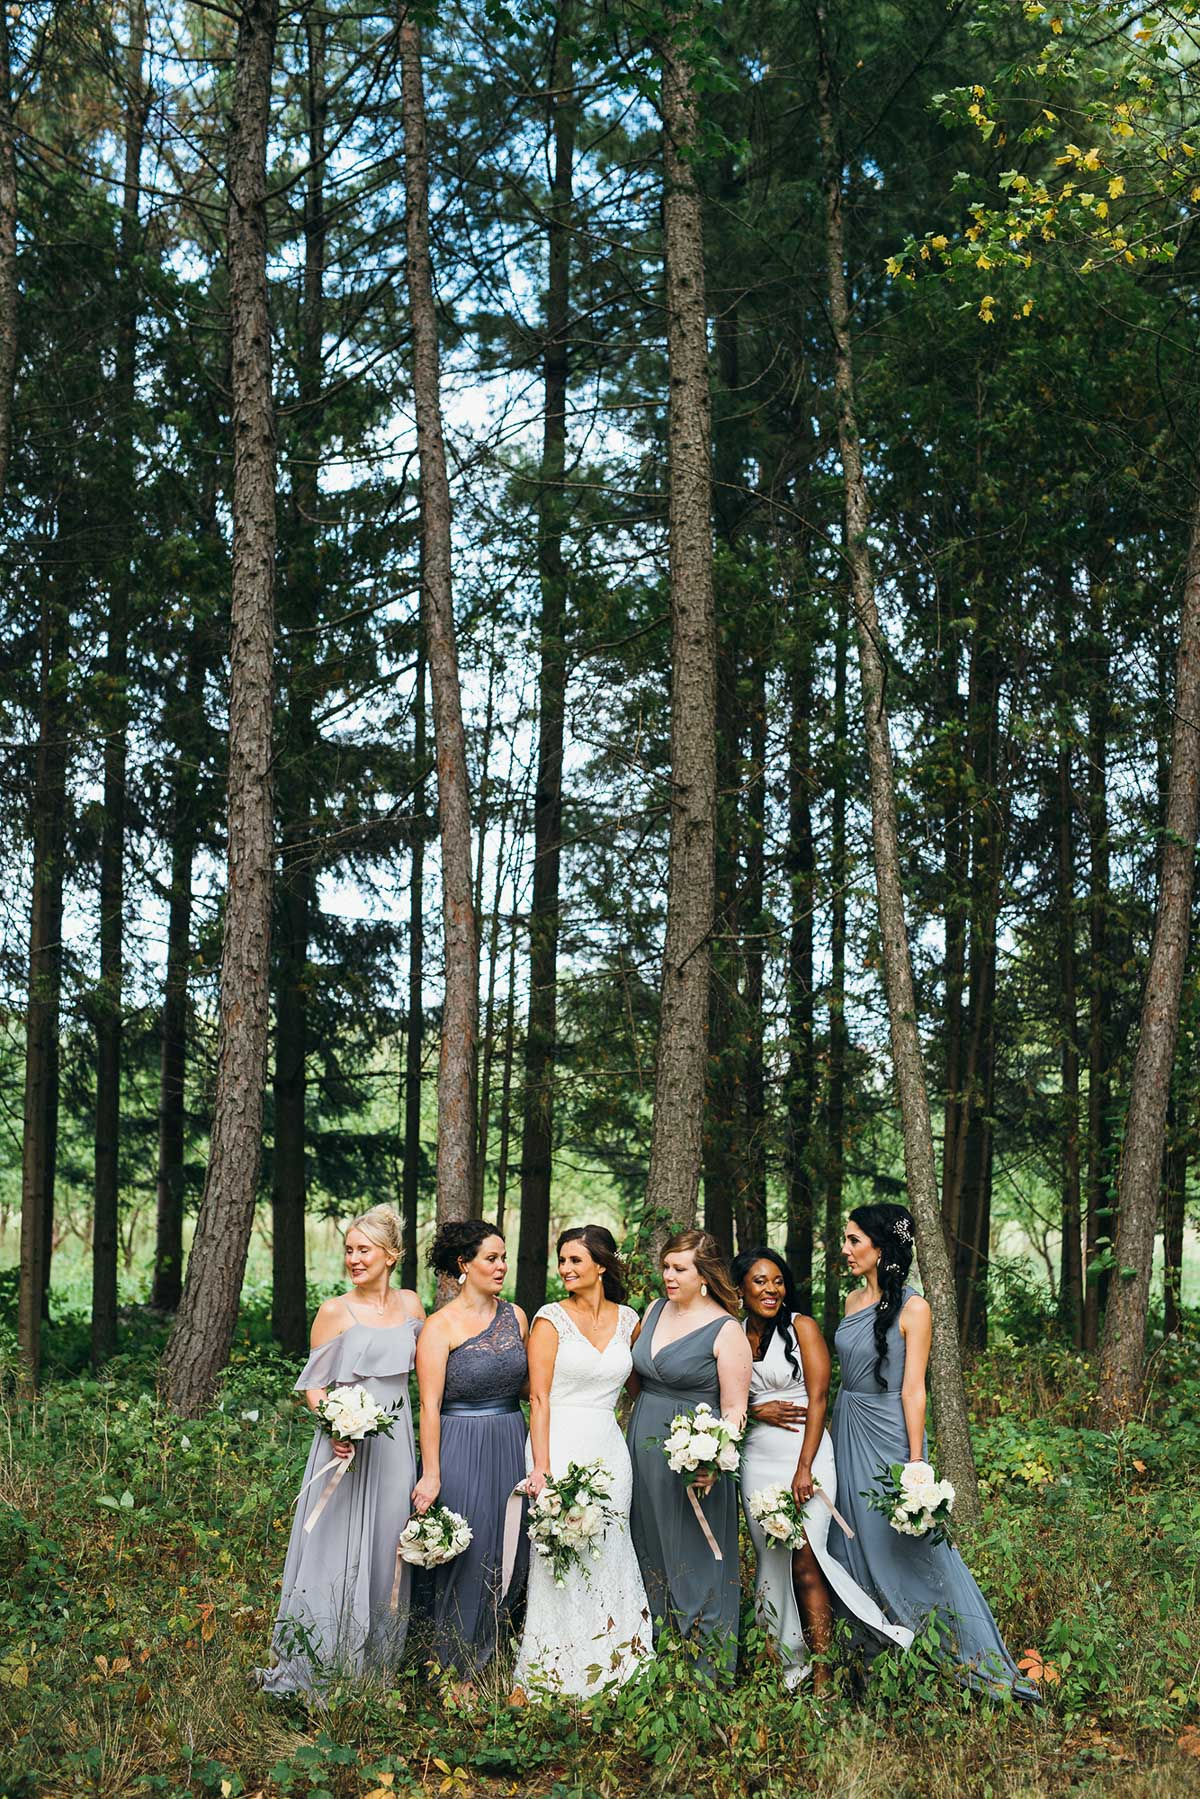 shaw-events-vineyard-bride-swish-list-kurtz-orchards-niagara-on-the-lake-wedding-57.jpg